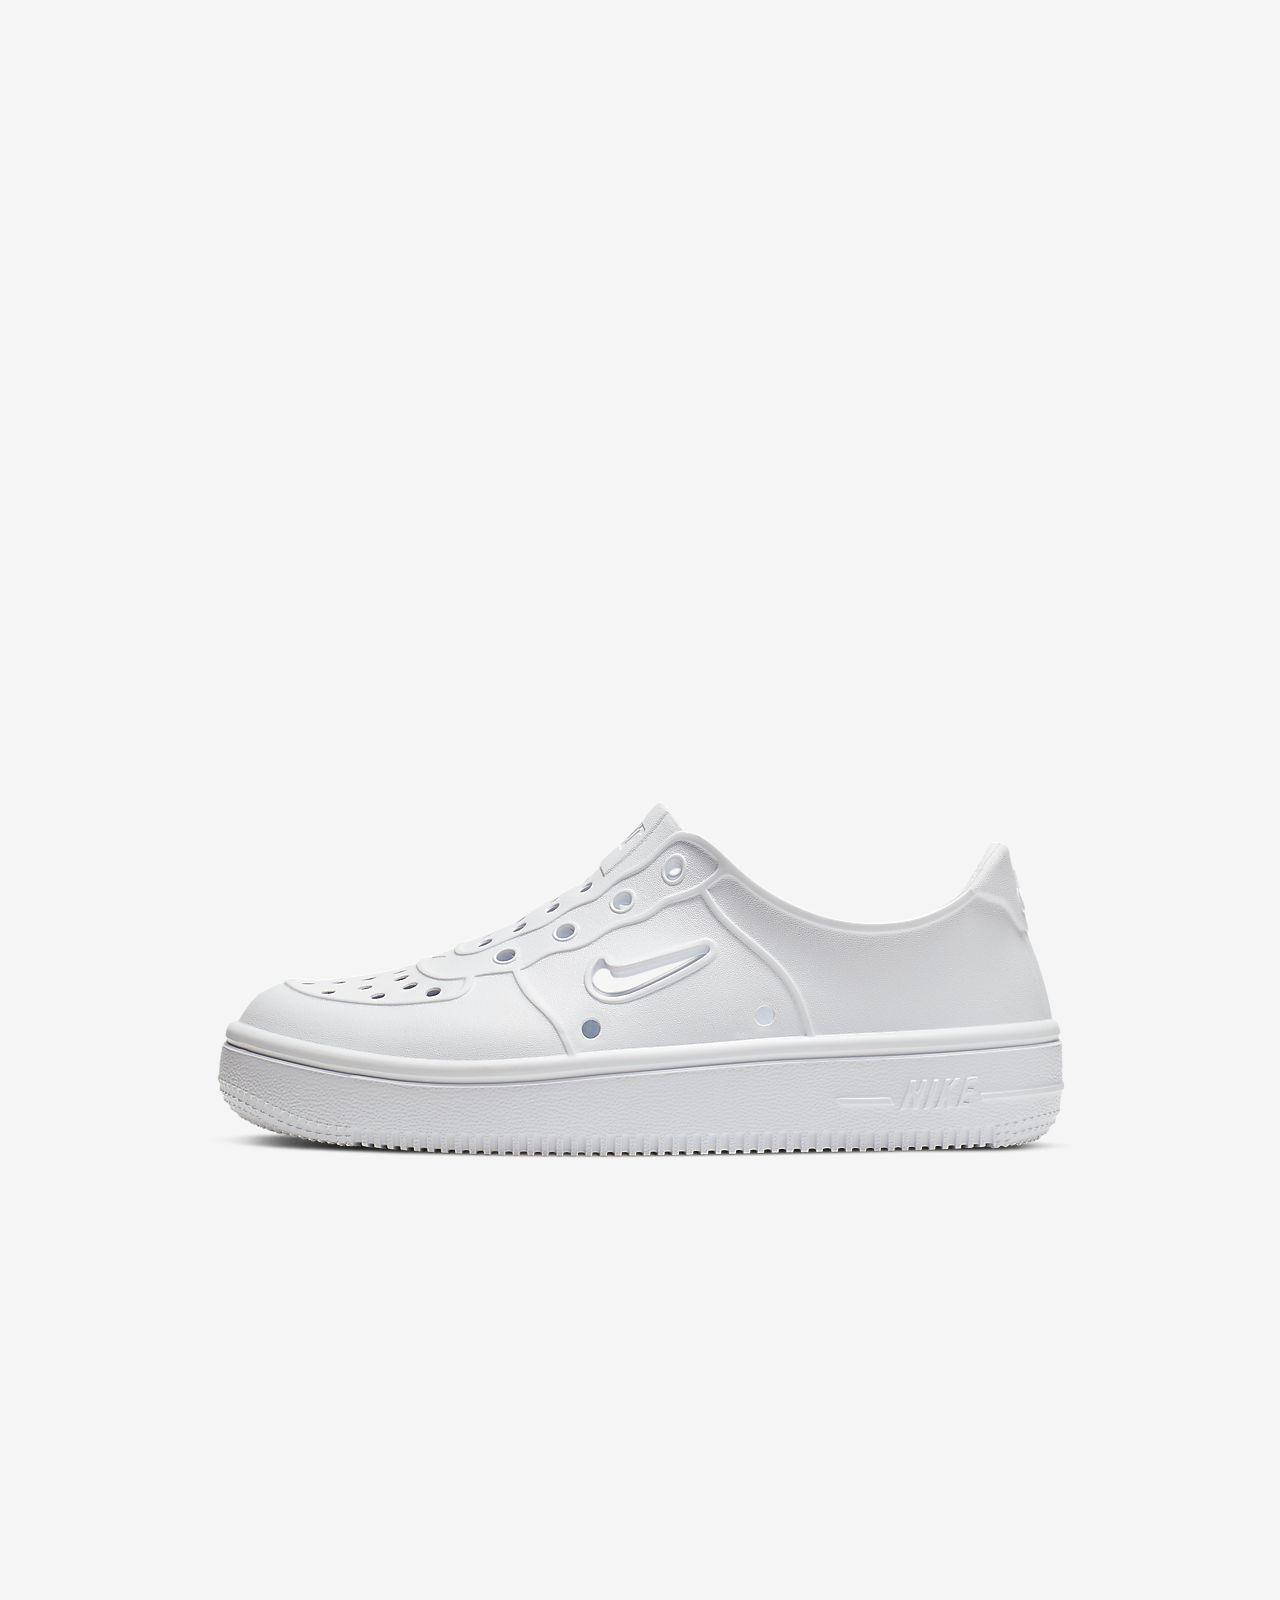 Nike Foam Force 1 Schuh für jüngere Kinder